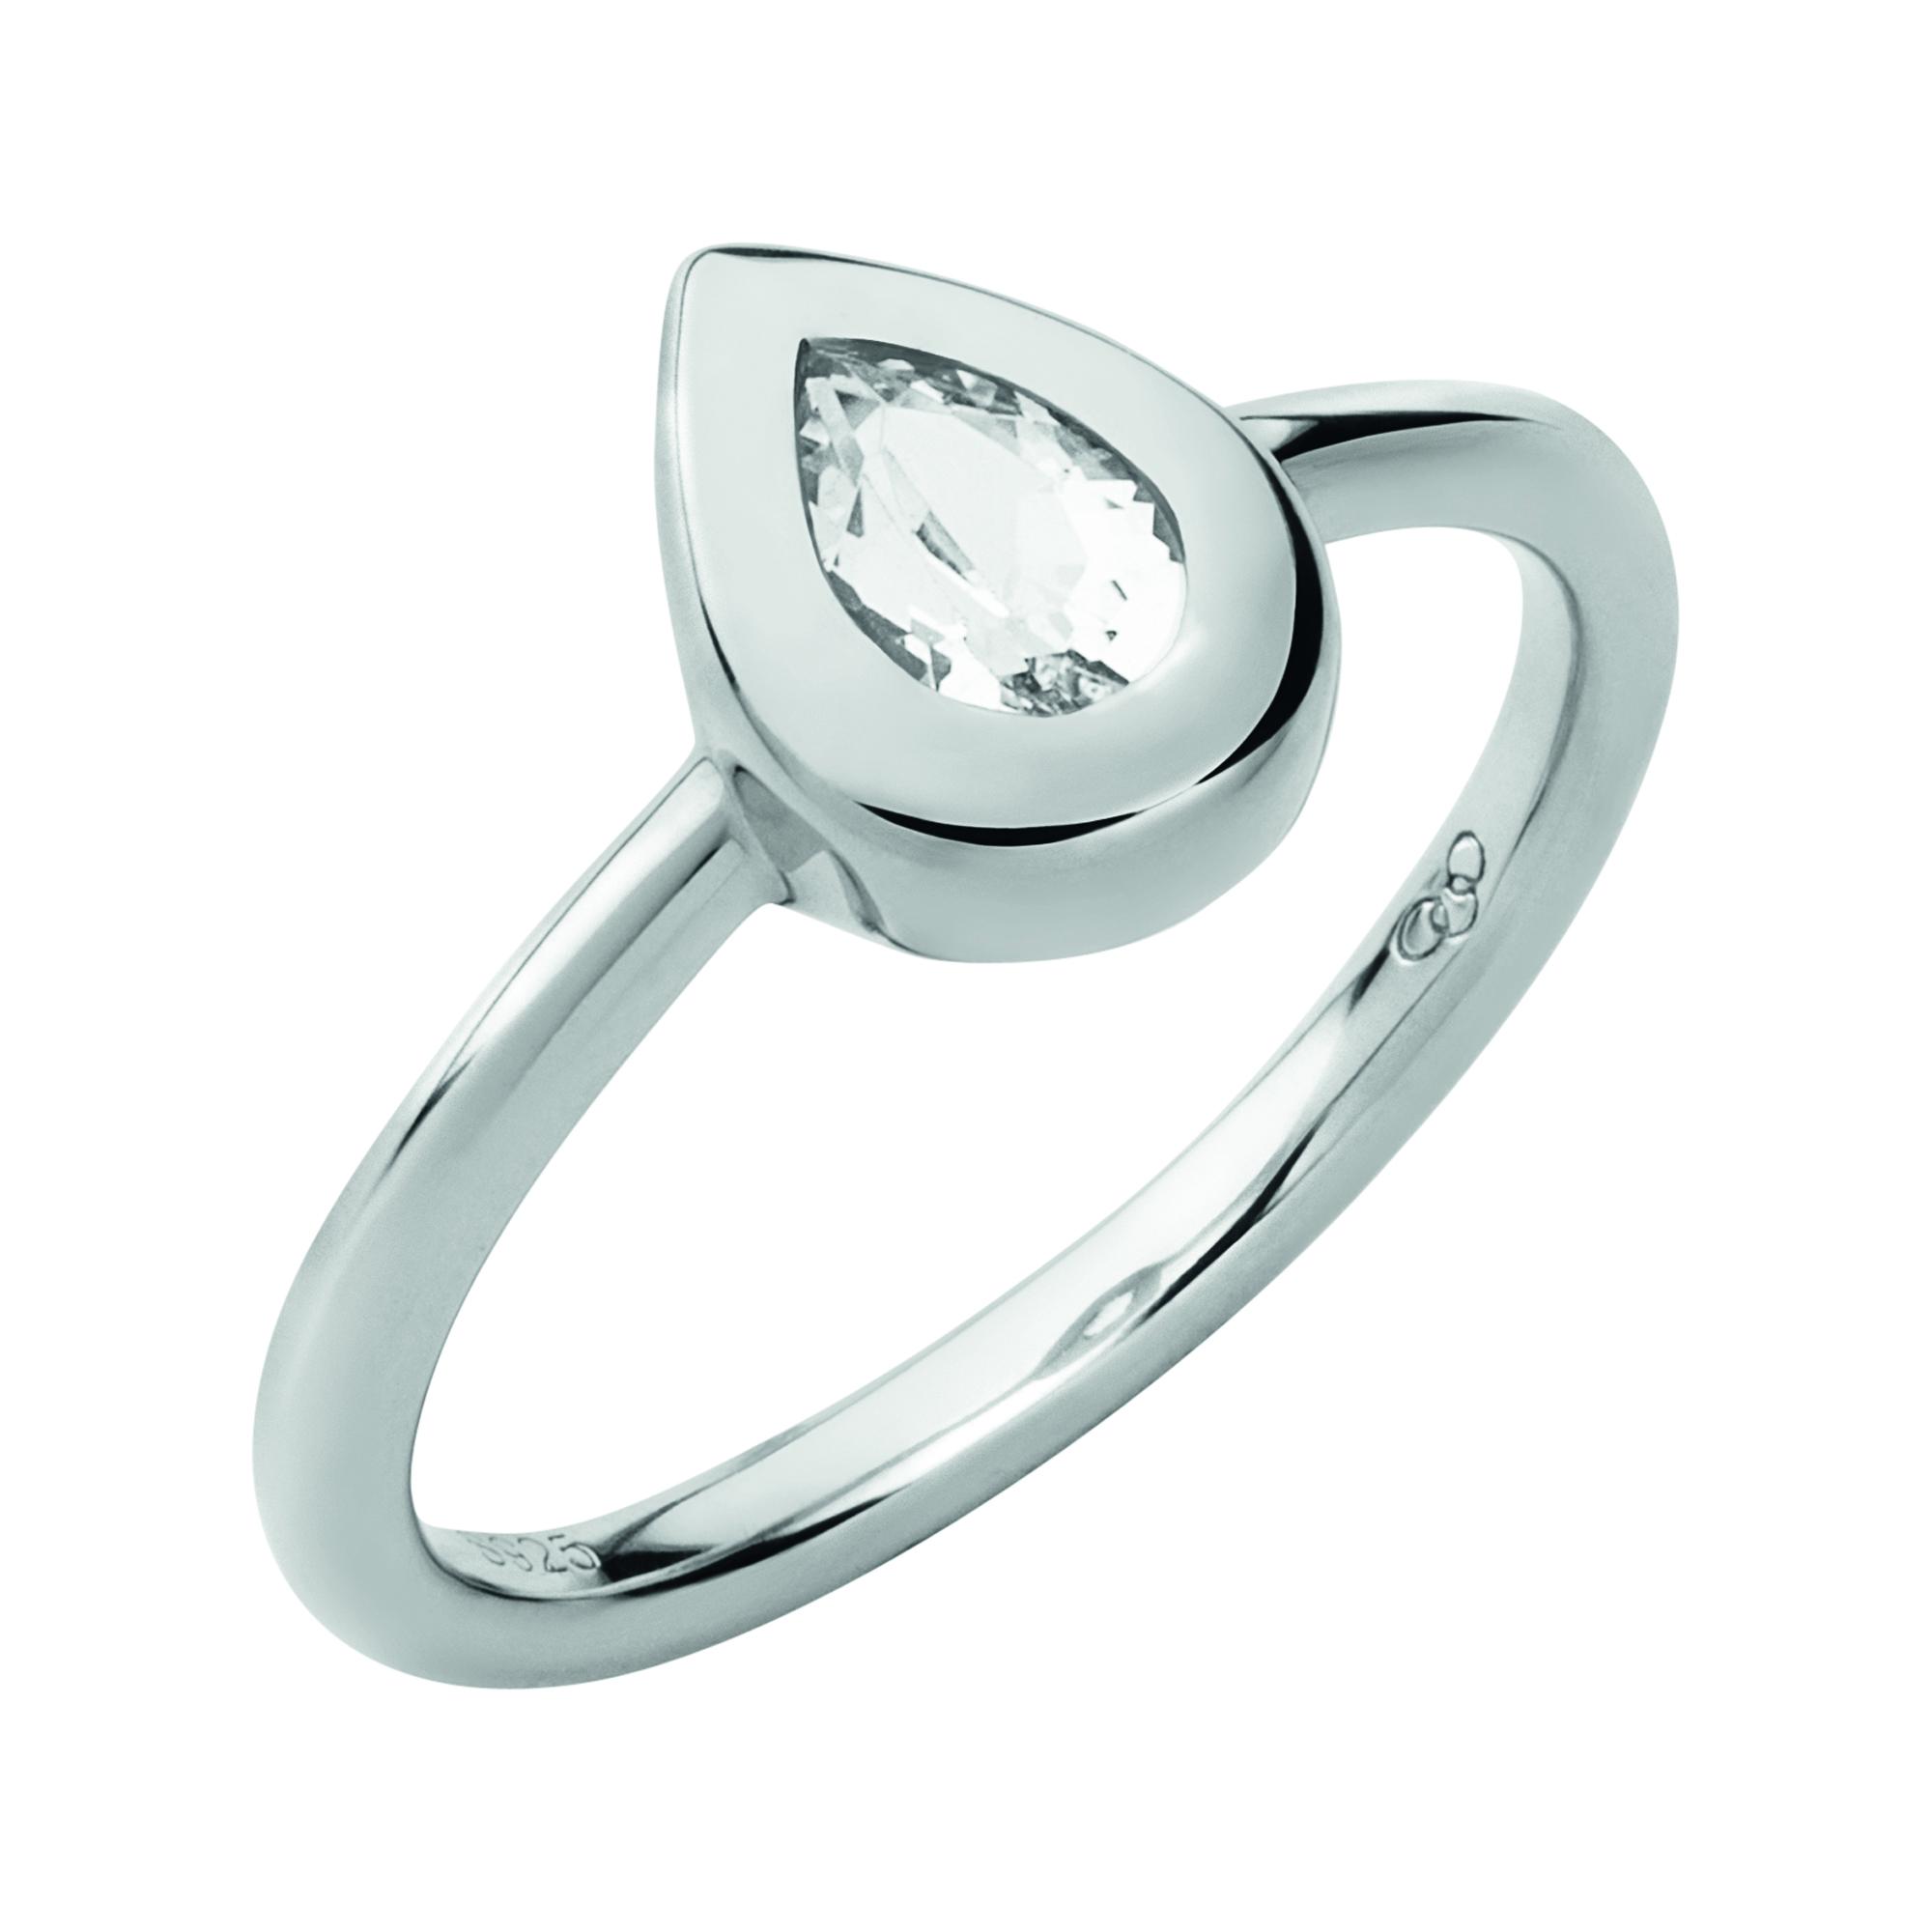 LINKS OF LONDON - Ασημένιο δαχτυλίδι ROSE DEW - μέγεθος 51